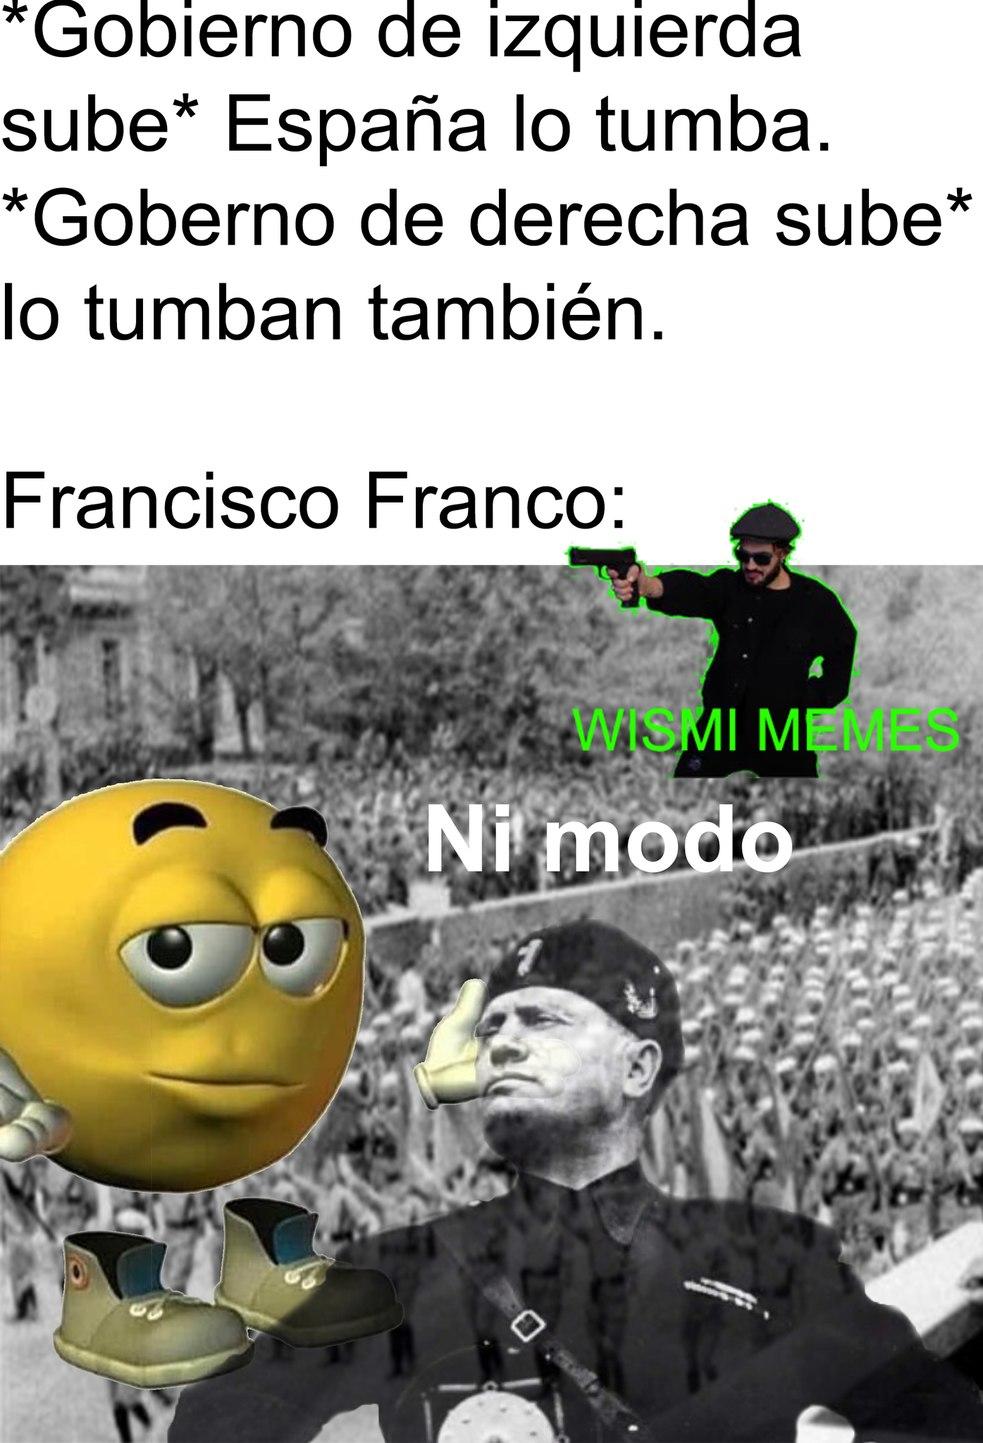 Franco Franco Franco Franco Franco Franco.... - meme